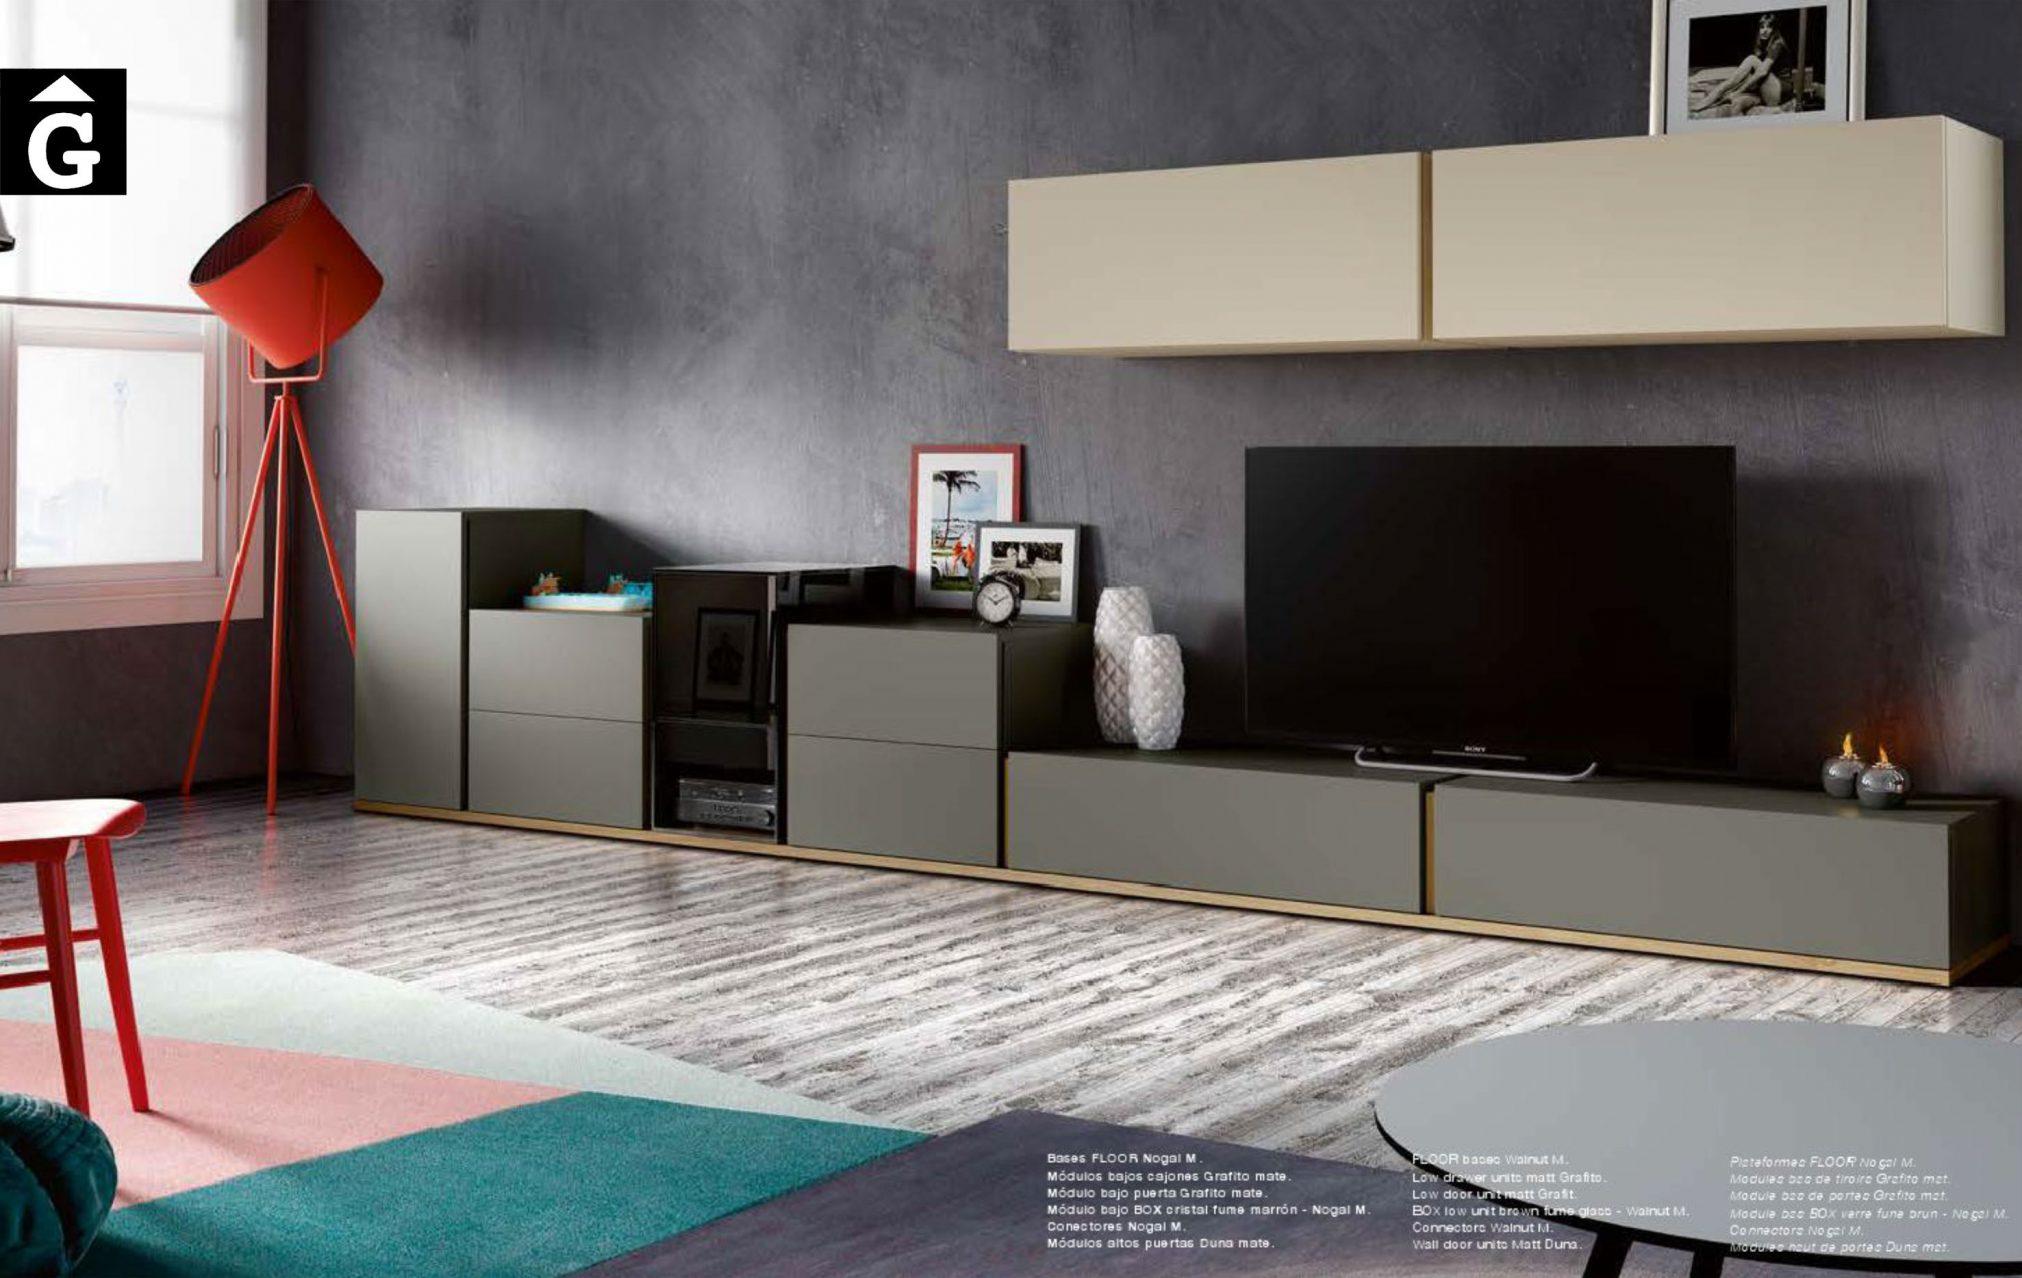 MOBLE-59-CONNECTOR-EMEDE-mobles-by-Mobles-GIFREU-Girona-ESPAI-EMEDE-Epacio-emede-Muebles-MD-moble-menjador-Sala-estar-habitatge-qualitat-laca-xapa-natural